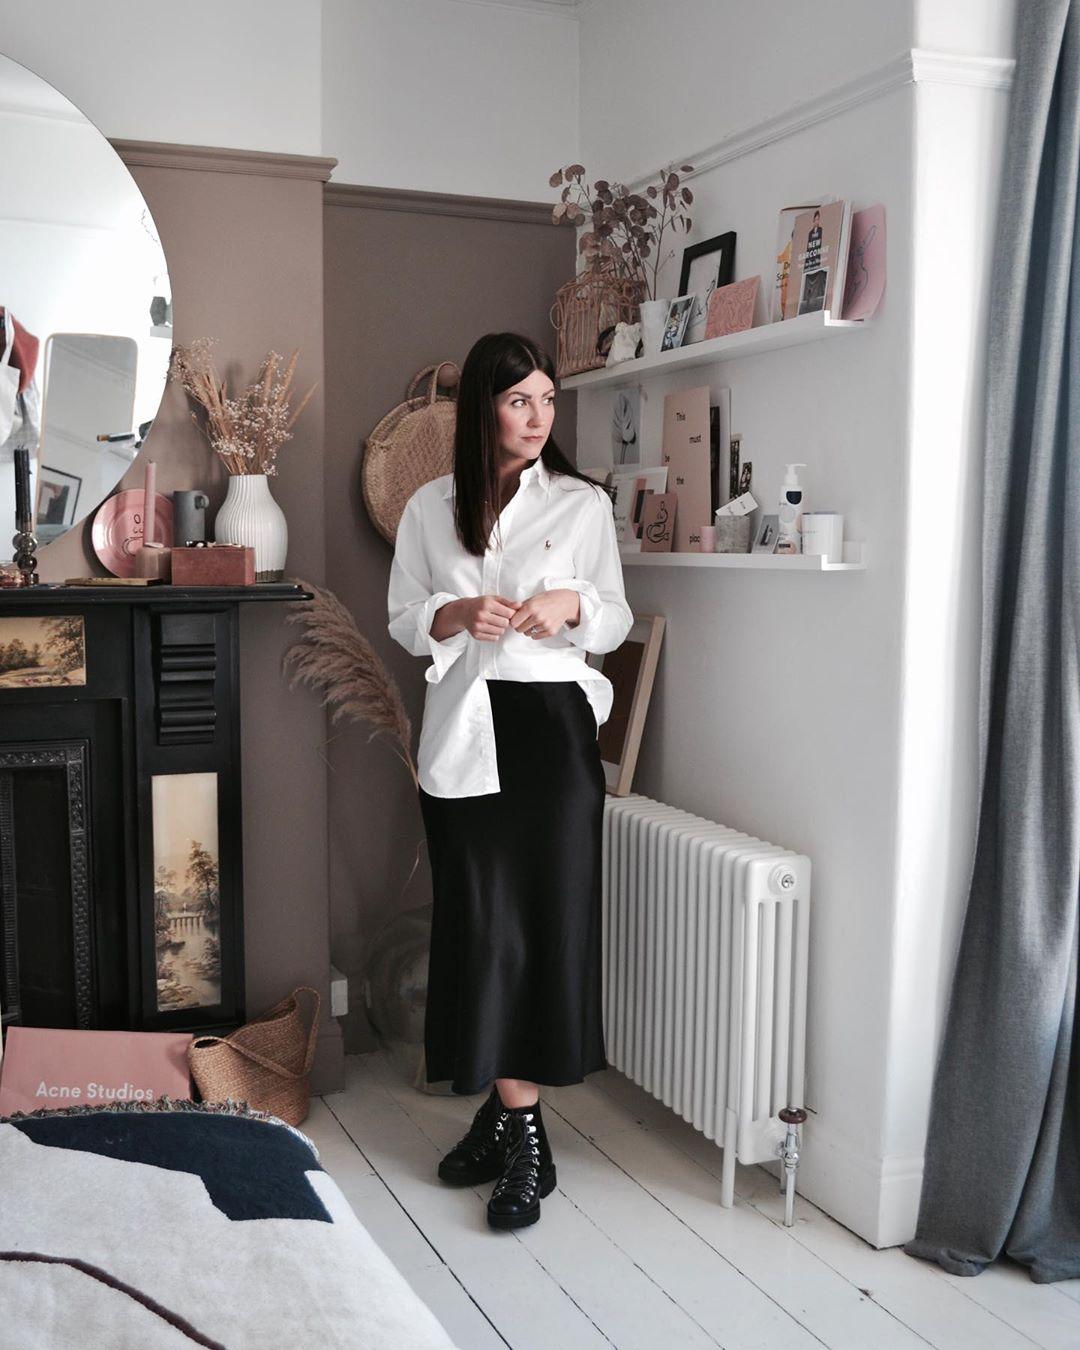 cassie chung in her bedroom